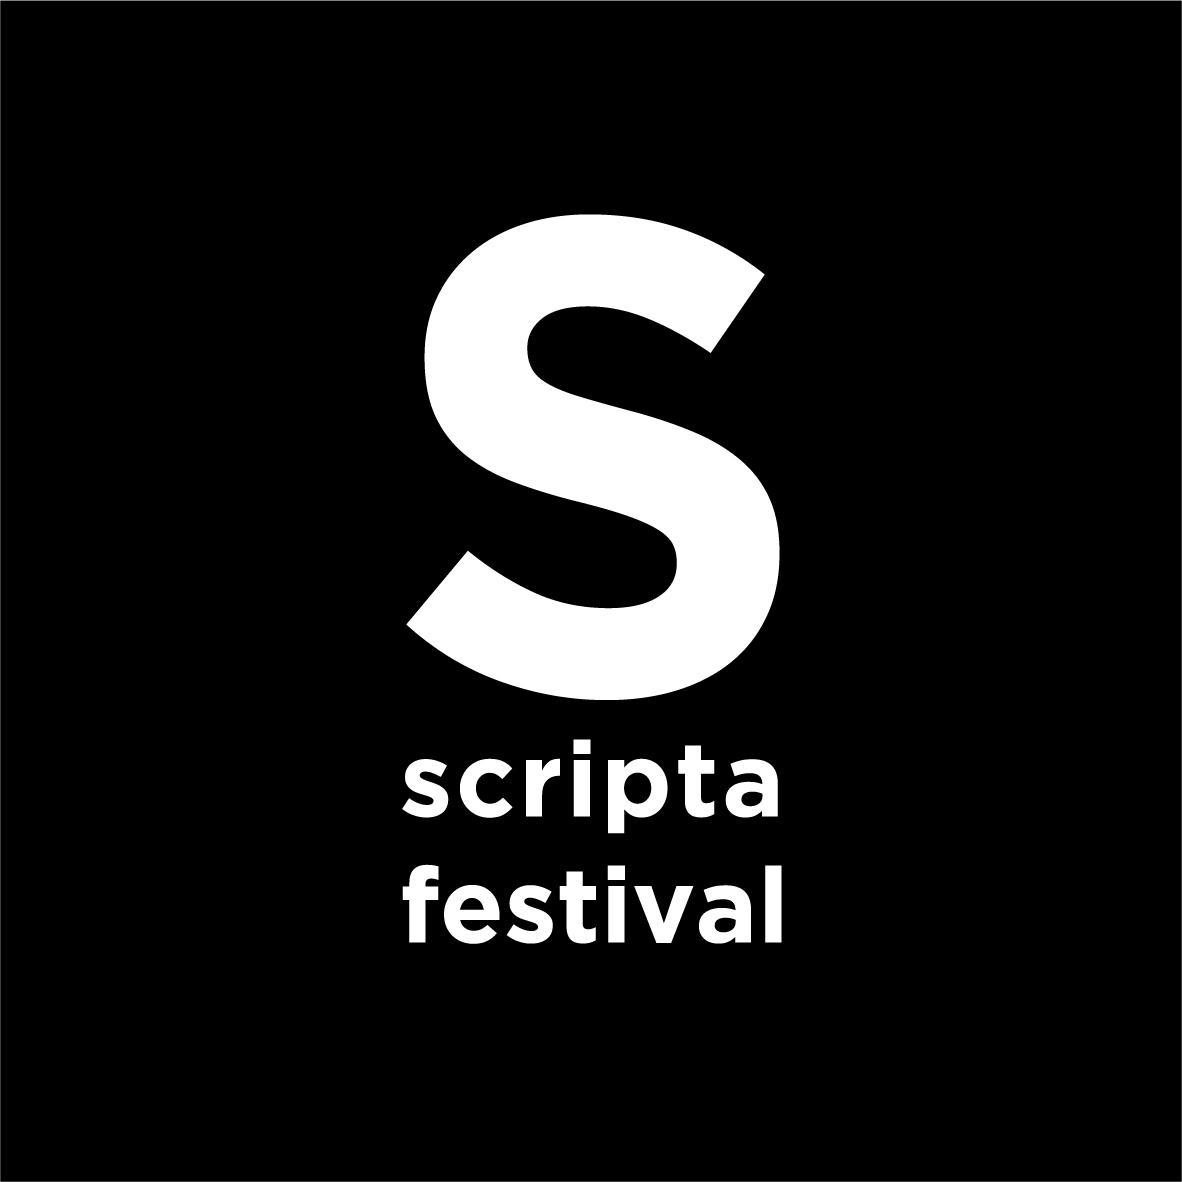 ScriptaFestival